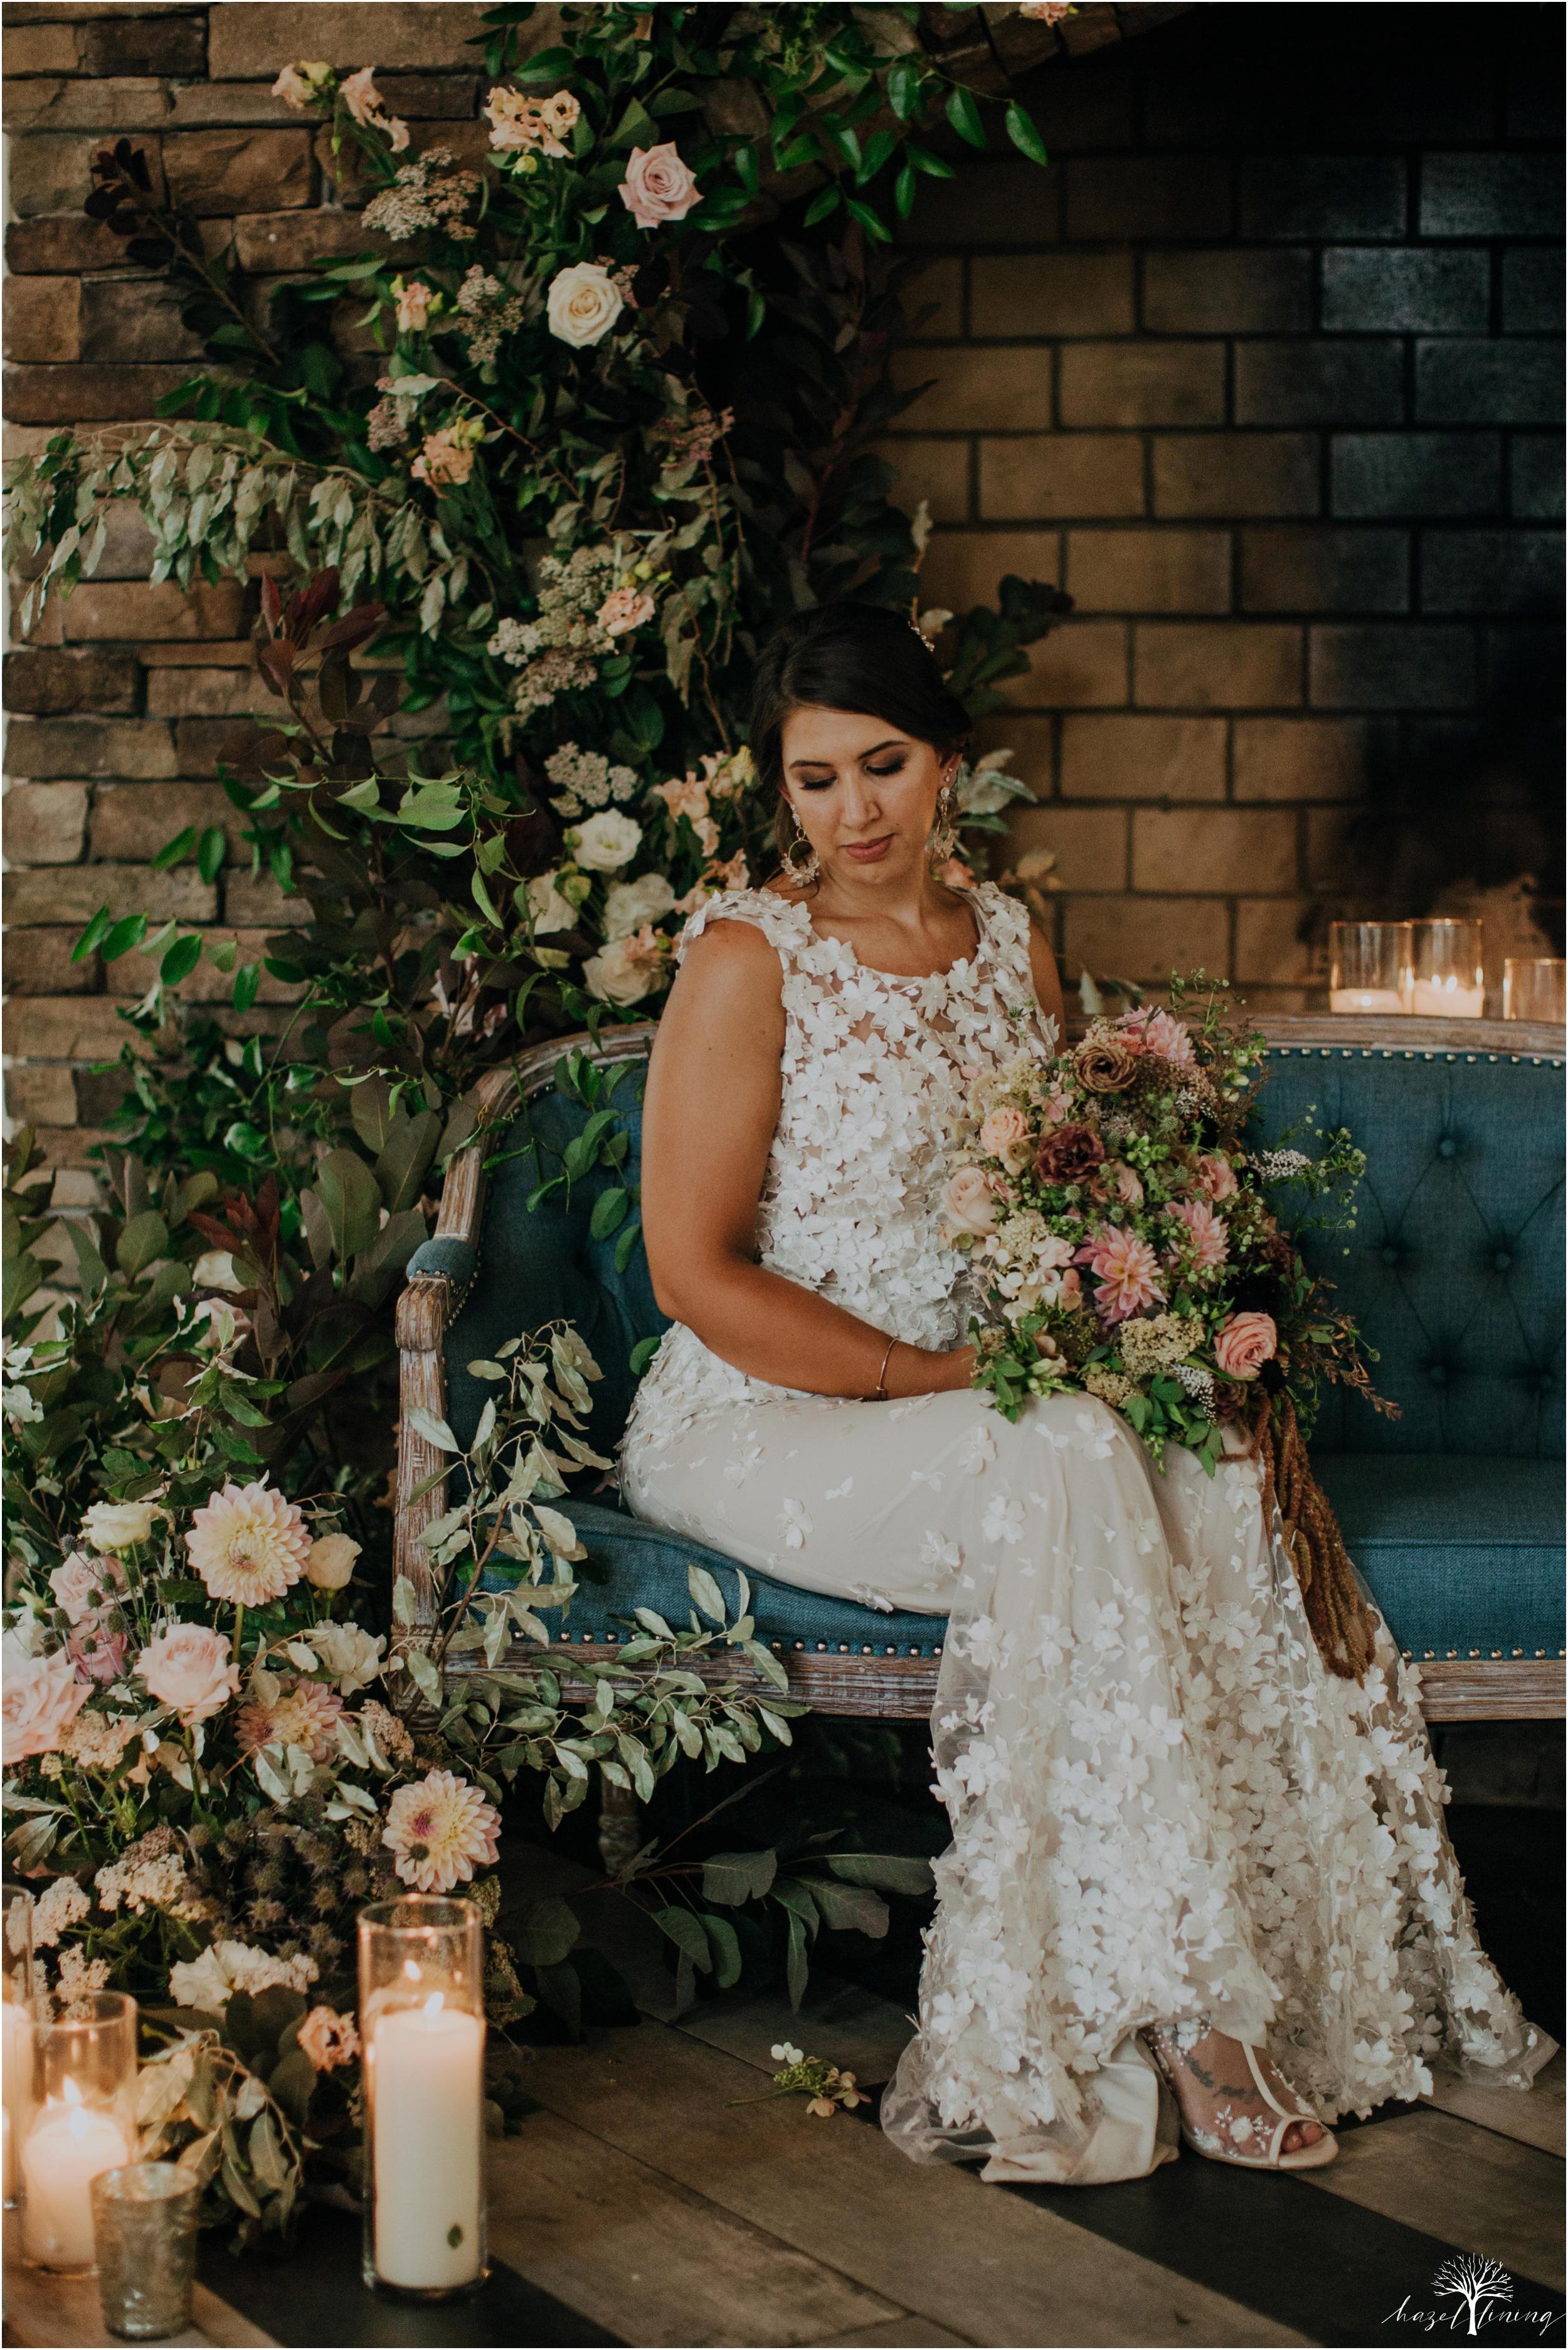 carl-chloe-the-ryland-inn-whitehouse-station-new-jersey-styled-squad-hazel-lining-photography-destination-elopement-wedding-engagement-photography_0048.jpg